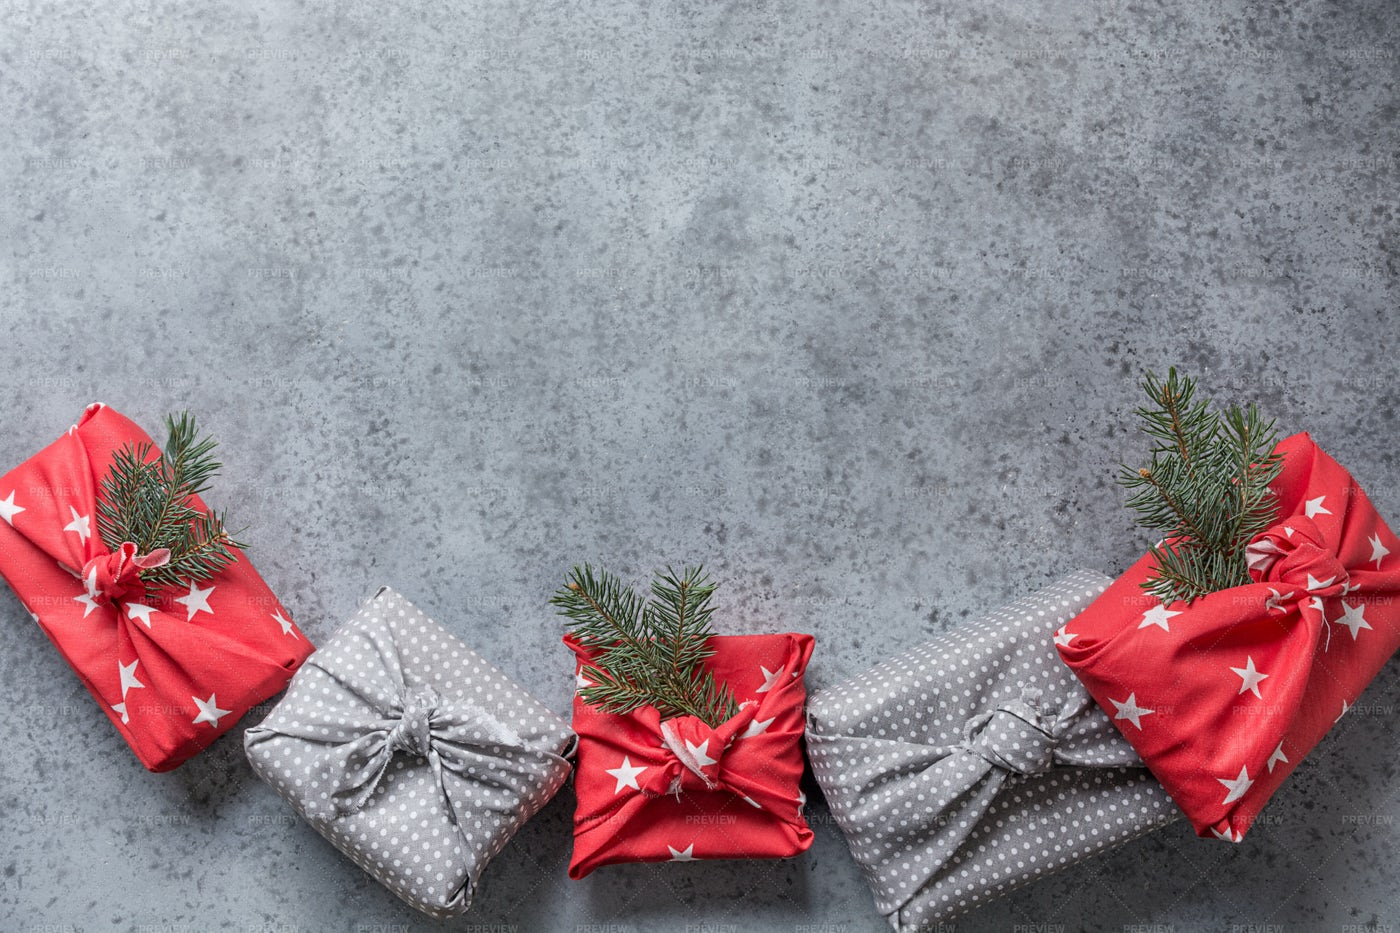 Christmas Gifts On Gray: Stock Photos